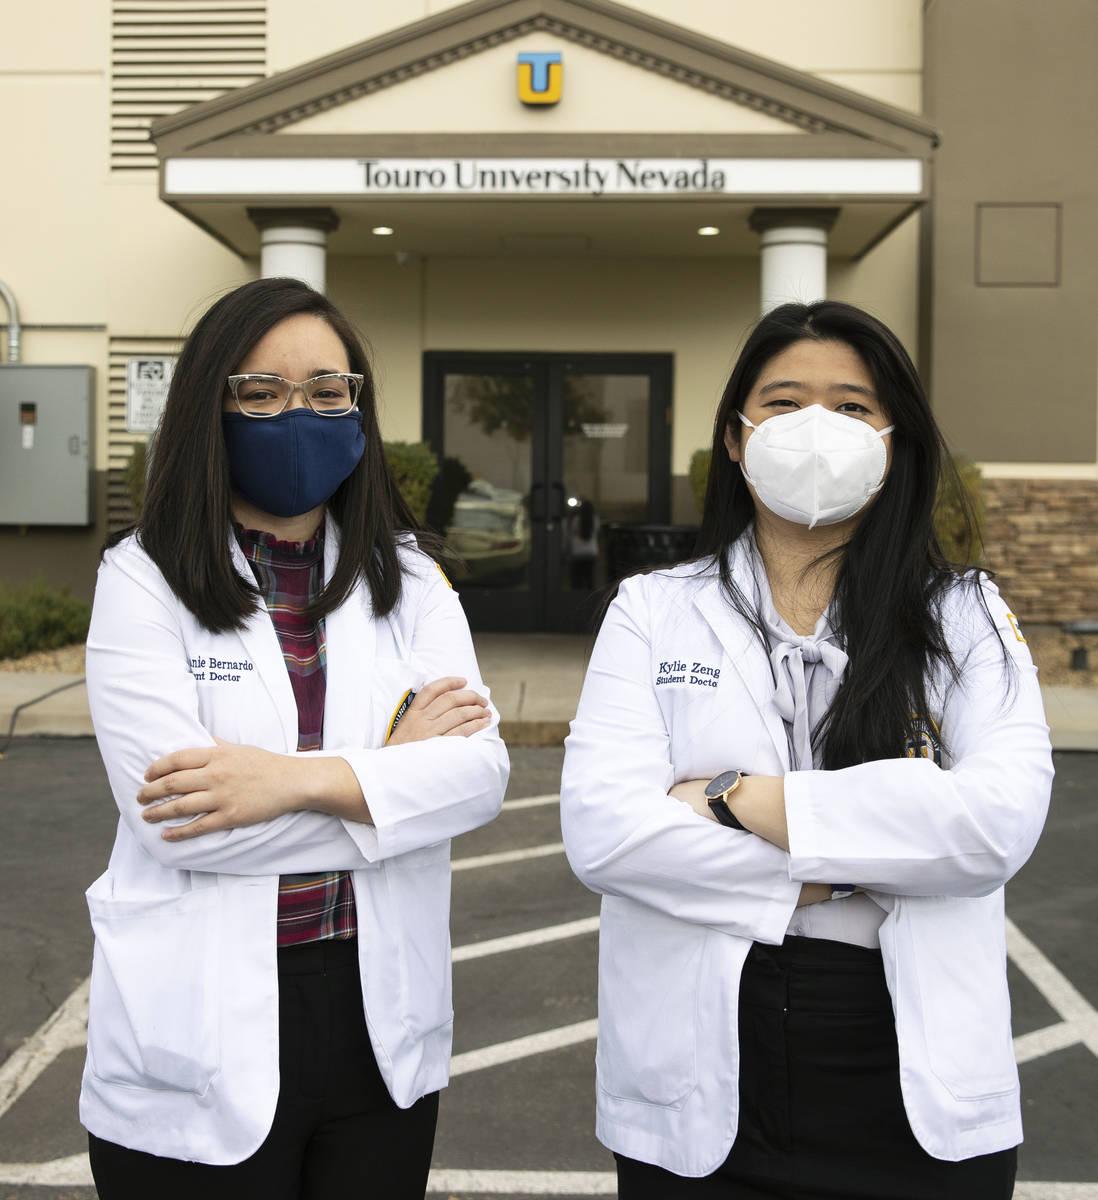 Toro University Nevada students, Stephanie Bernardo, left, and Kylie Zeng pose for a photo, on ...